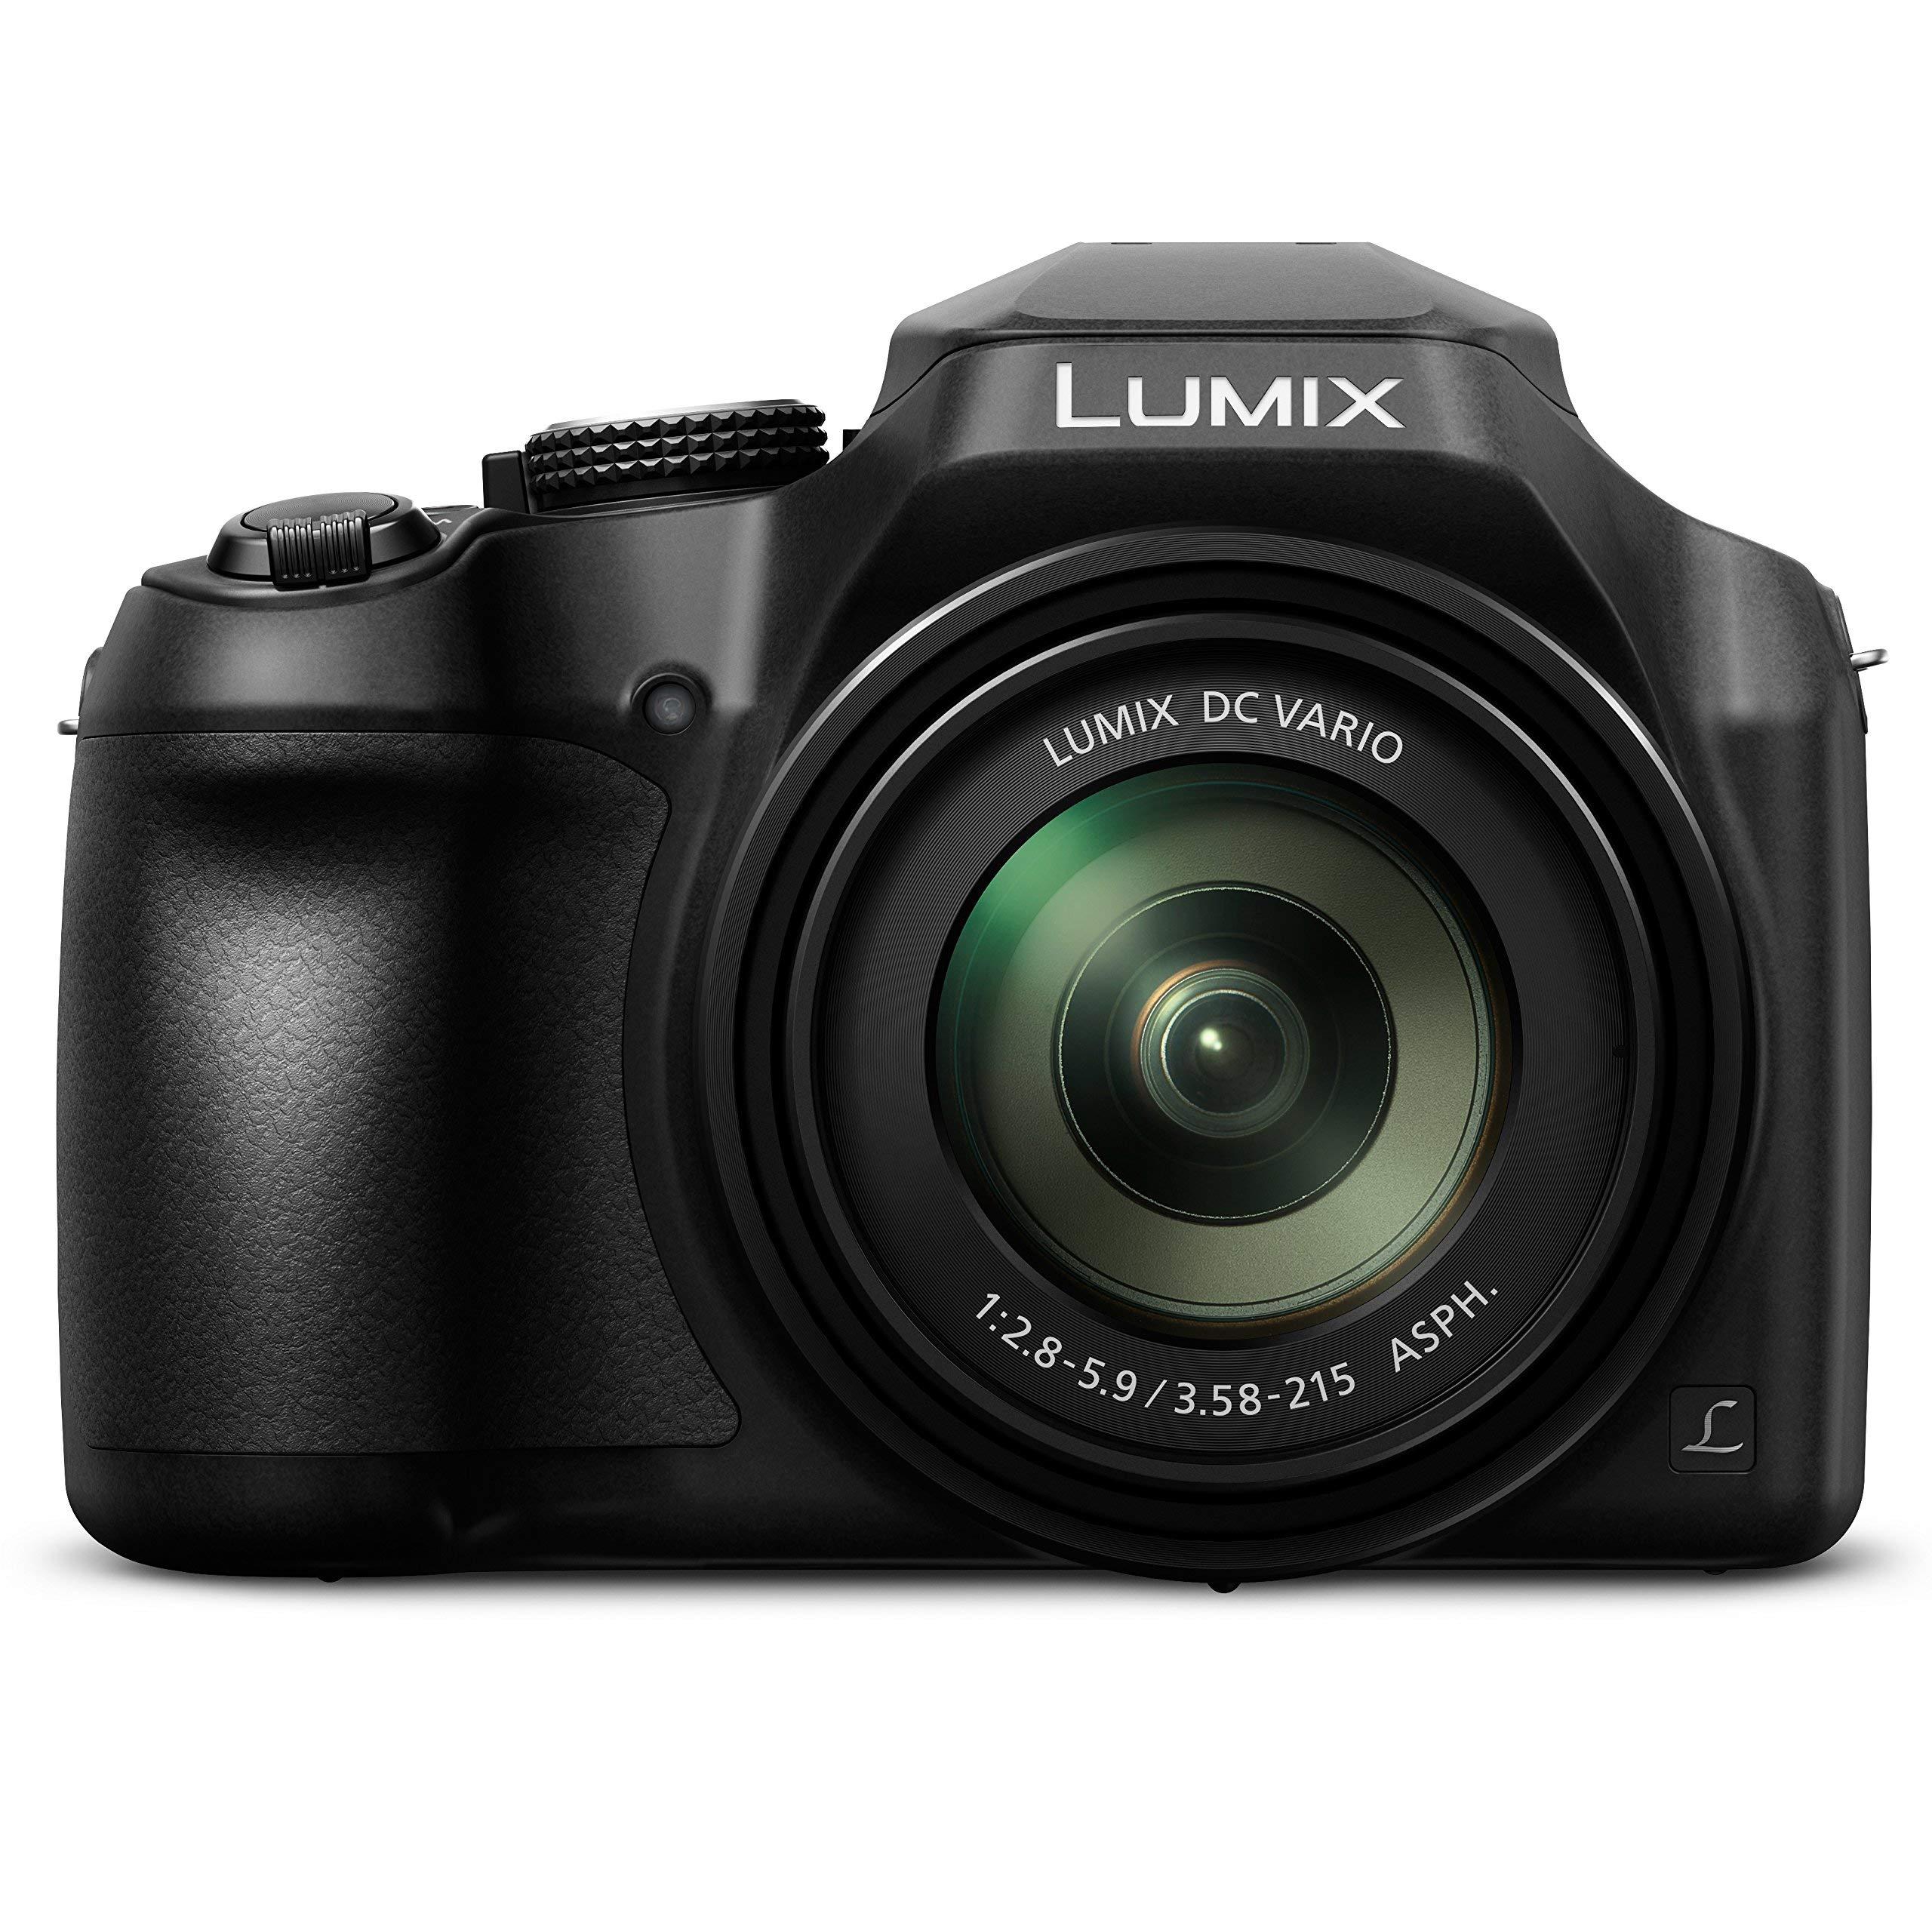 PANASONIC LUMIX FZ80 4K 60X Zoom Camera, 18.1 Megapixels, DC VARIO 20-1200mm Lens, F2.8-5.9, 4K 30p Video, Power O.I.S., WiFi ? DC-FZ80K (USA BLACK) (Renewed) by Panasonic